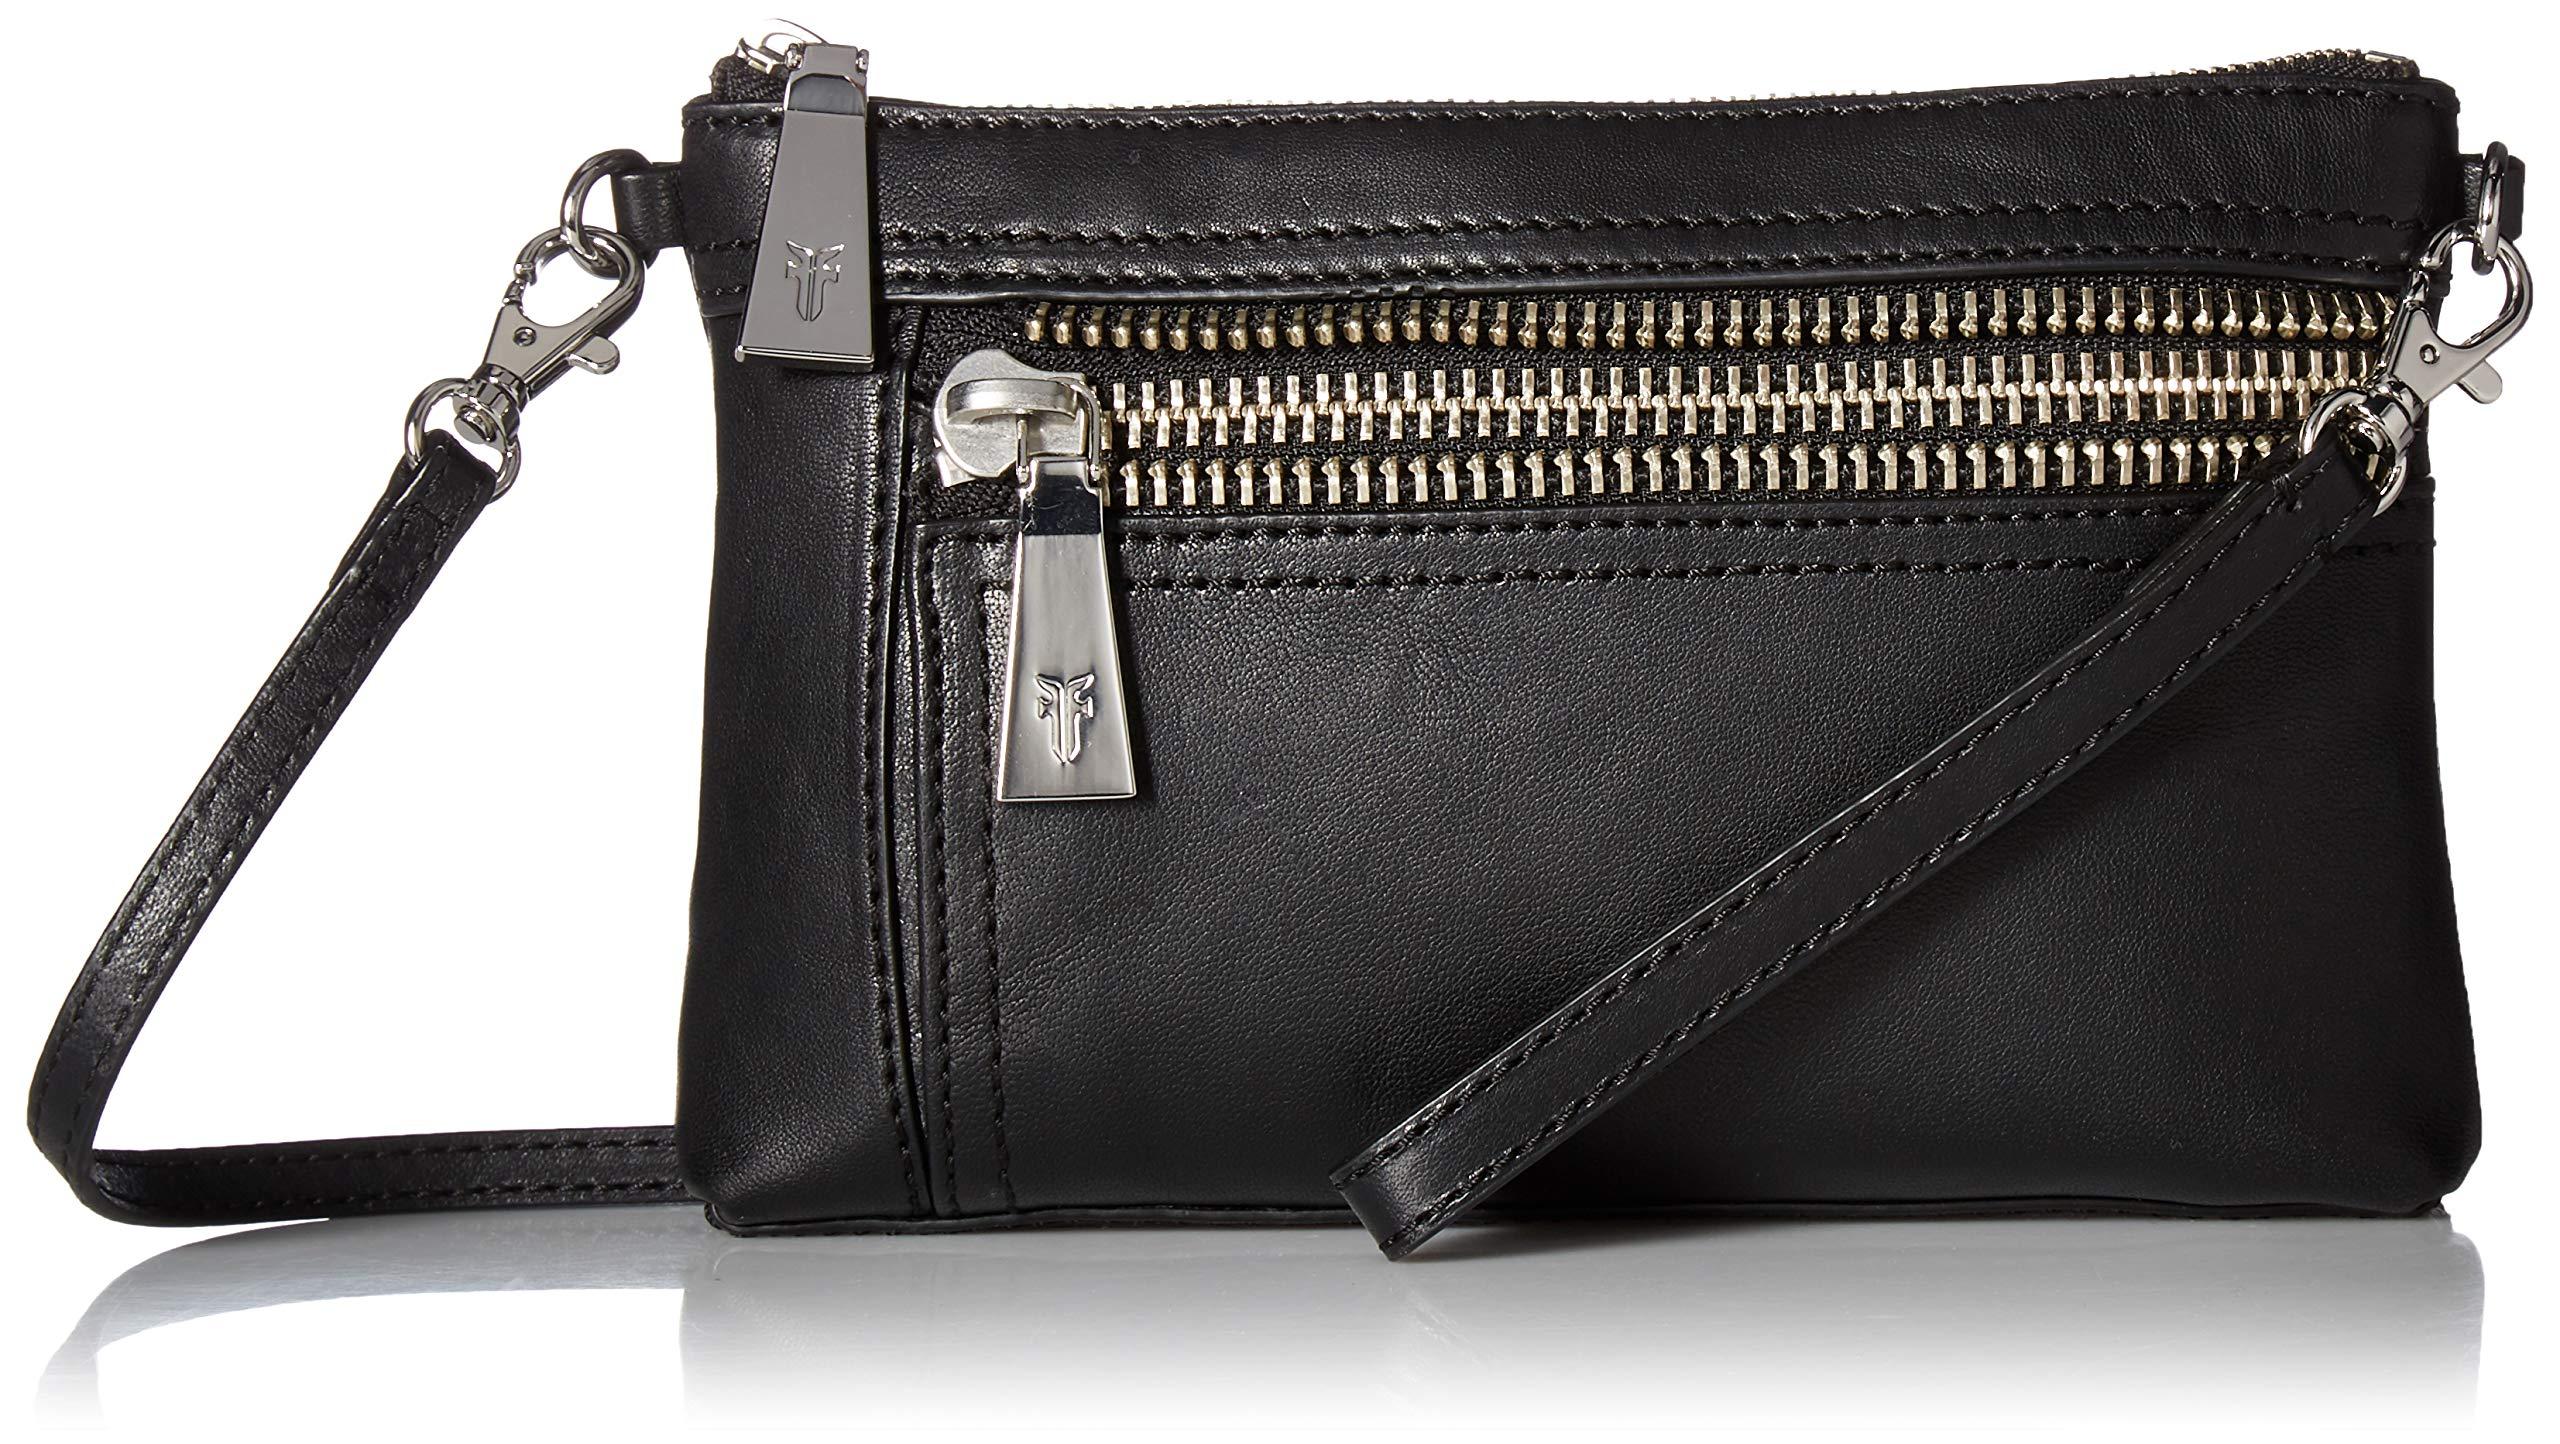 FRYE Lena Zip Leather Crossbody Wristlet Bag, black